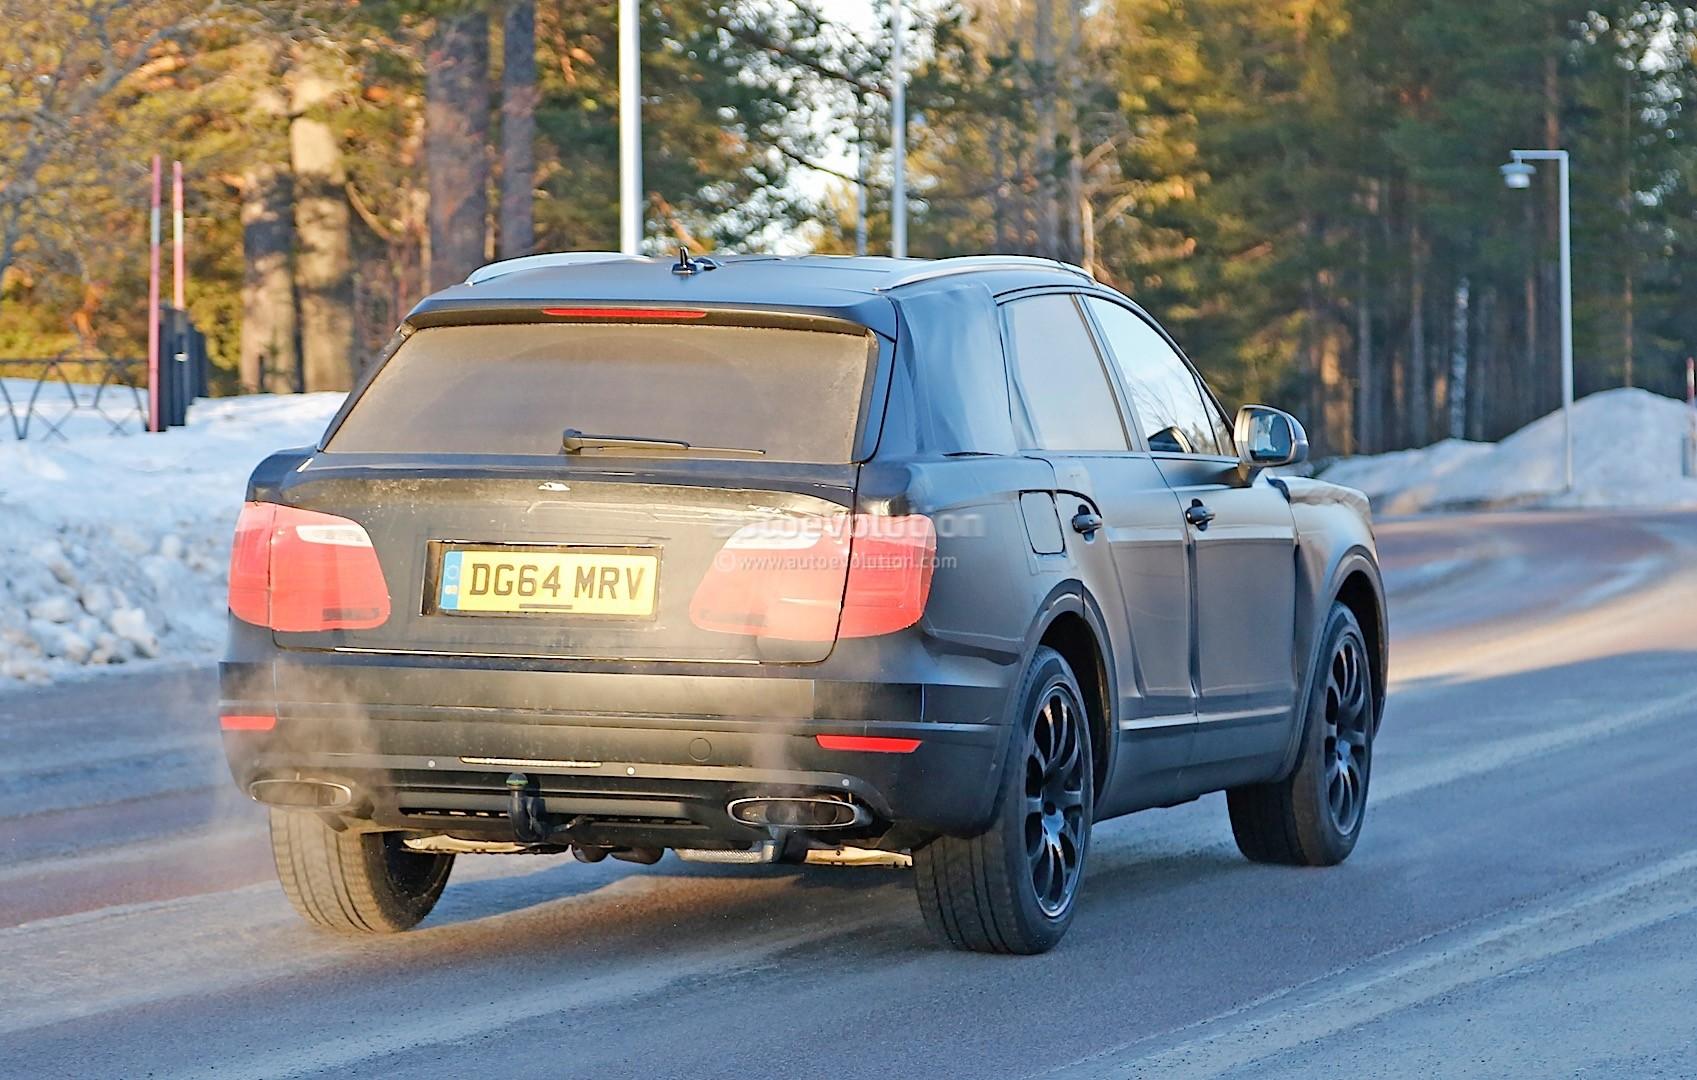 2015 - [Bentley] Bentayga - Page 5 Bentley-bentayga-spied-once-again-looks-like-an-edgier-vw-touareg-photo-gallery_9